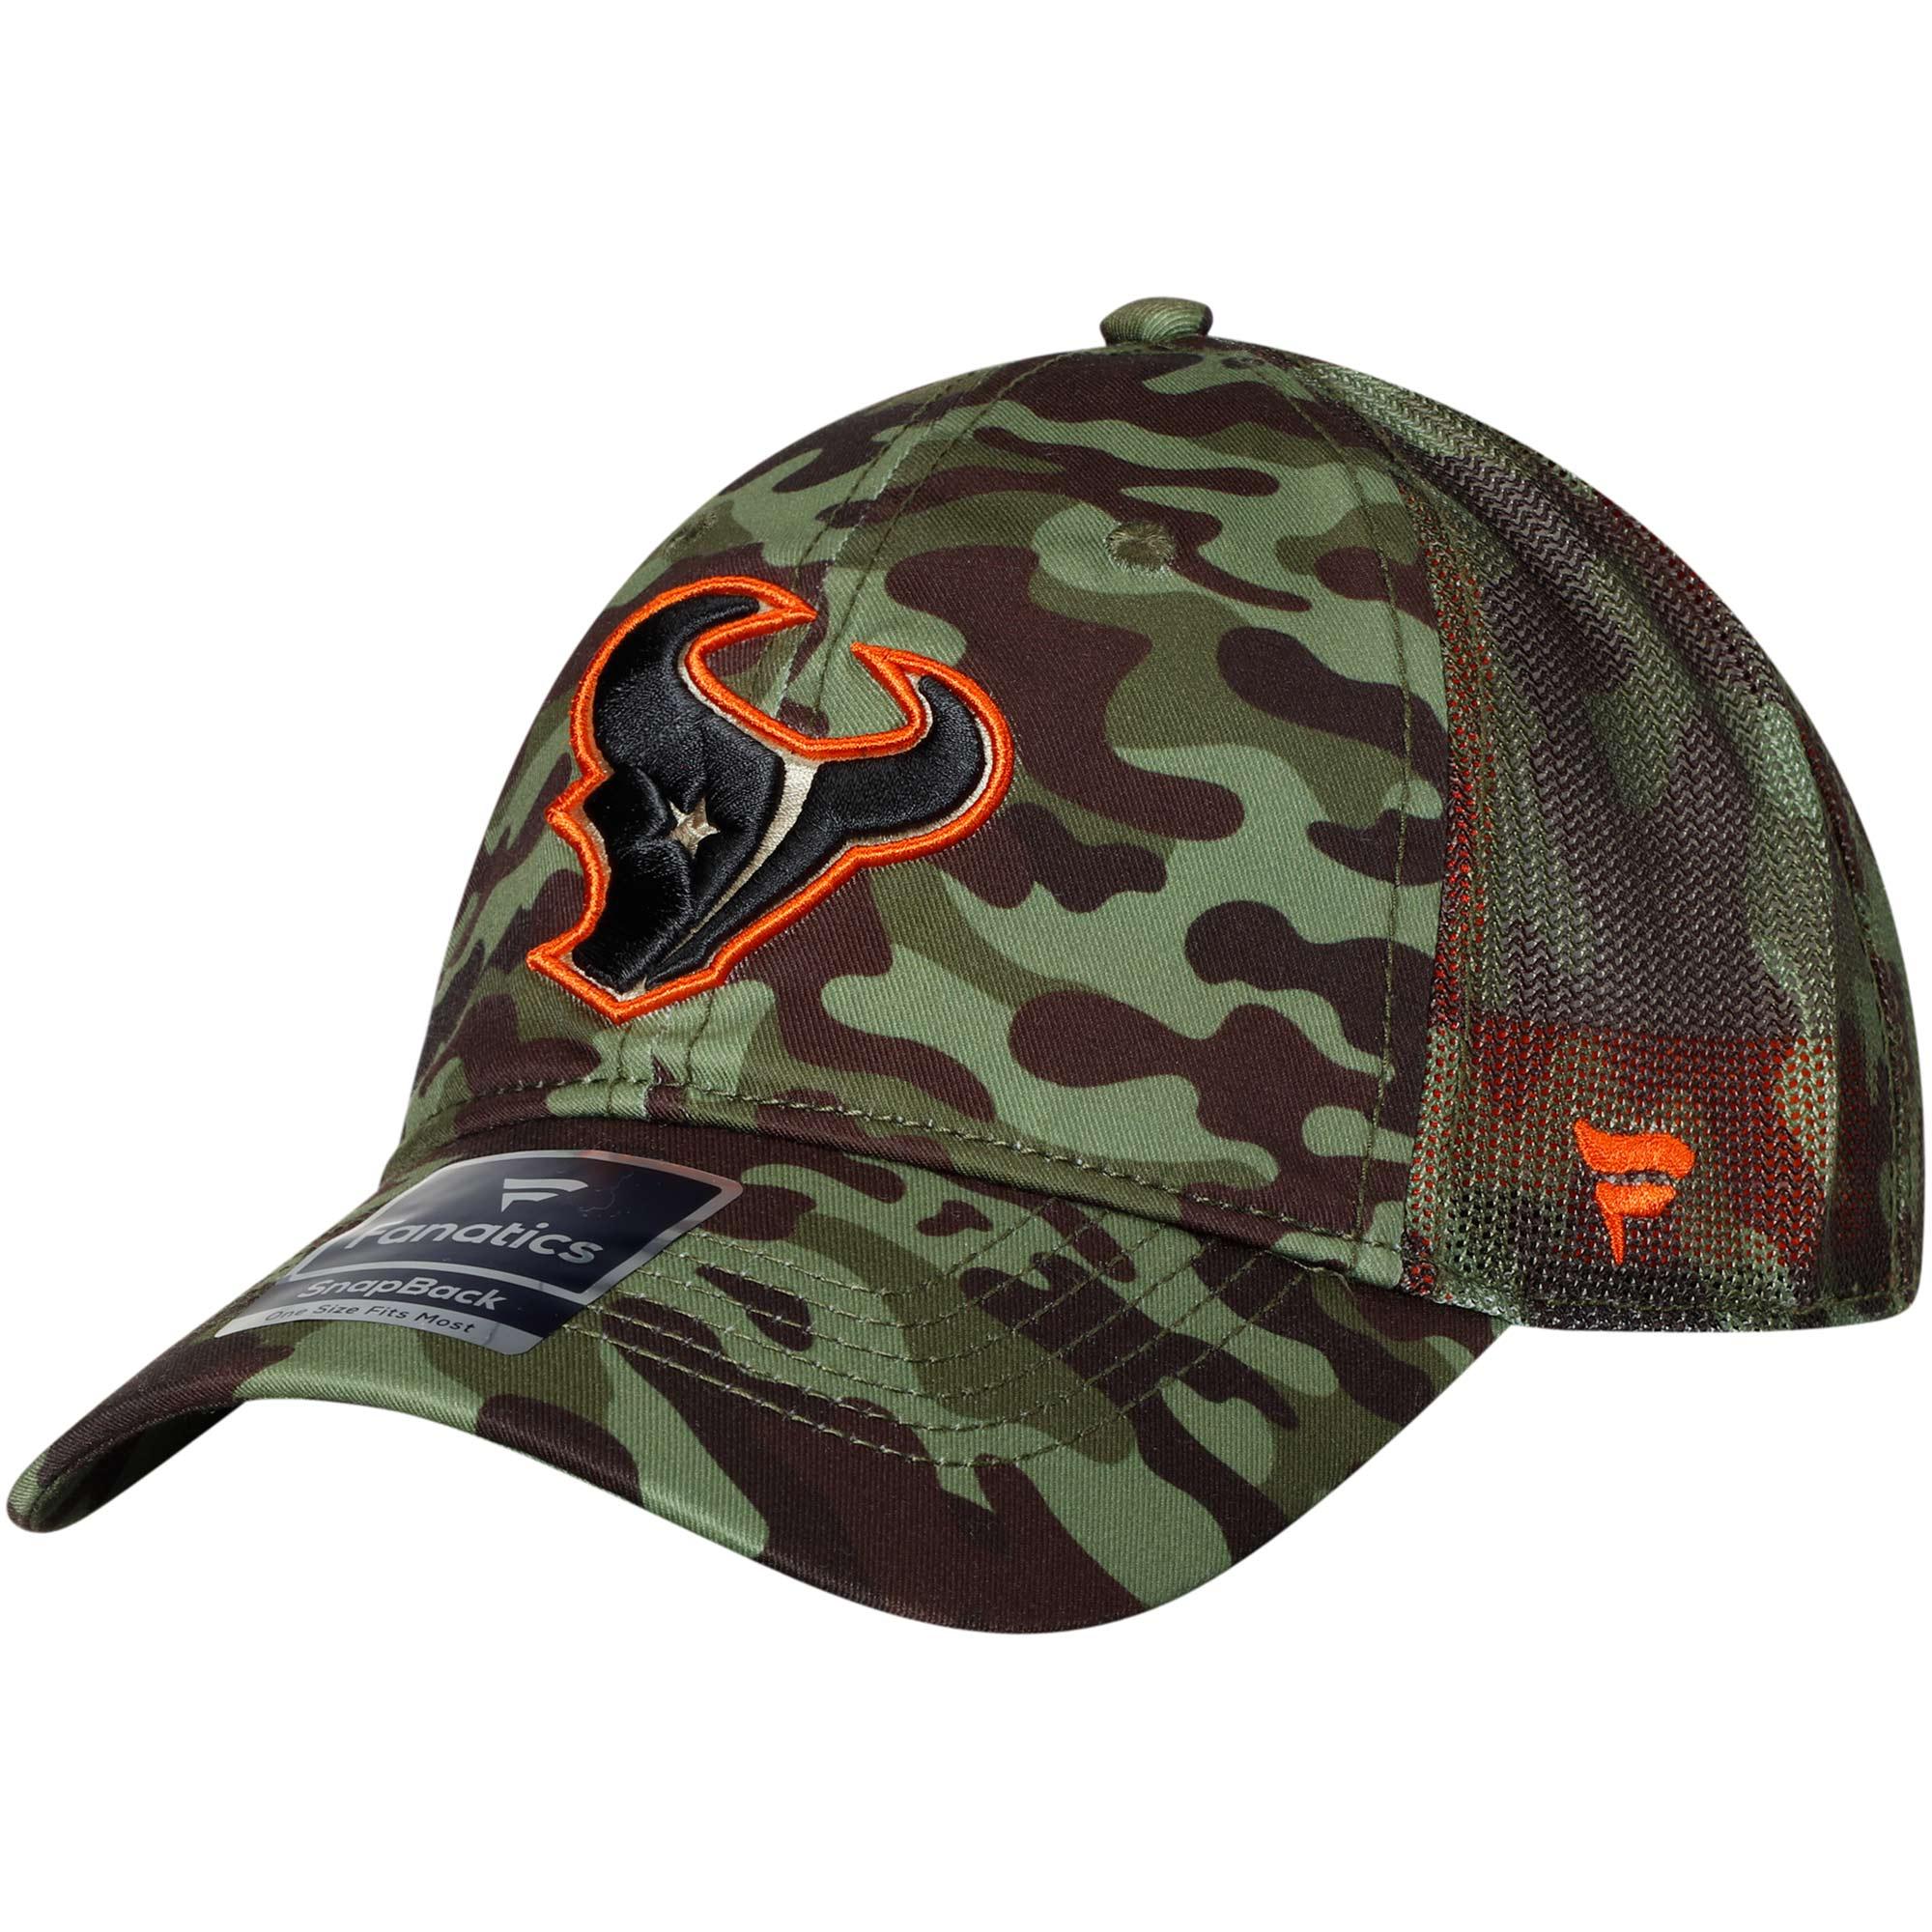 Houston Texans NFL Pro Line by Fanatics Branded Recon Trucker Adjustable Hat - Camo